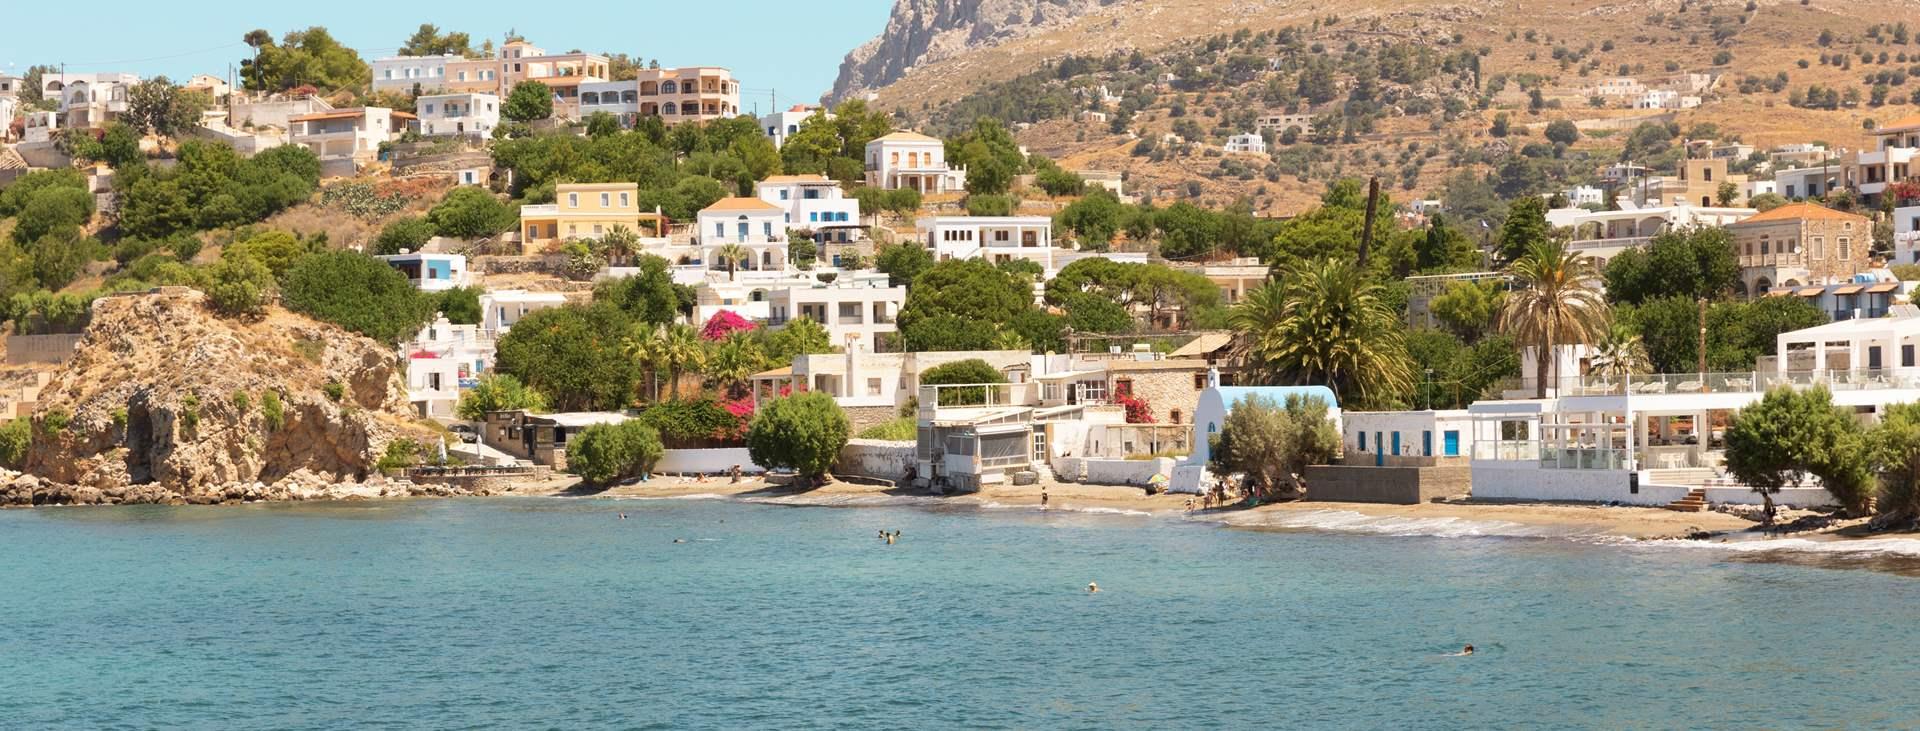 Bestill en reise med Ving til Kantouni på den greske øya Kalymnos